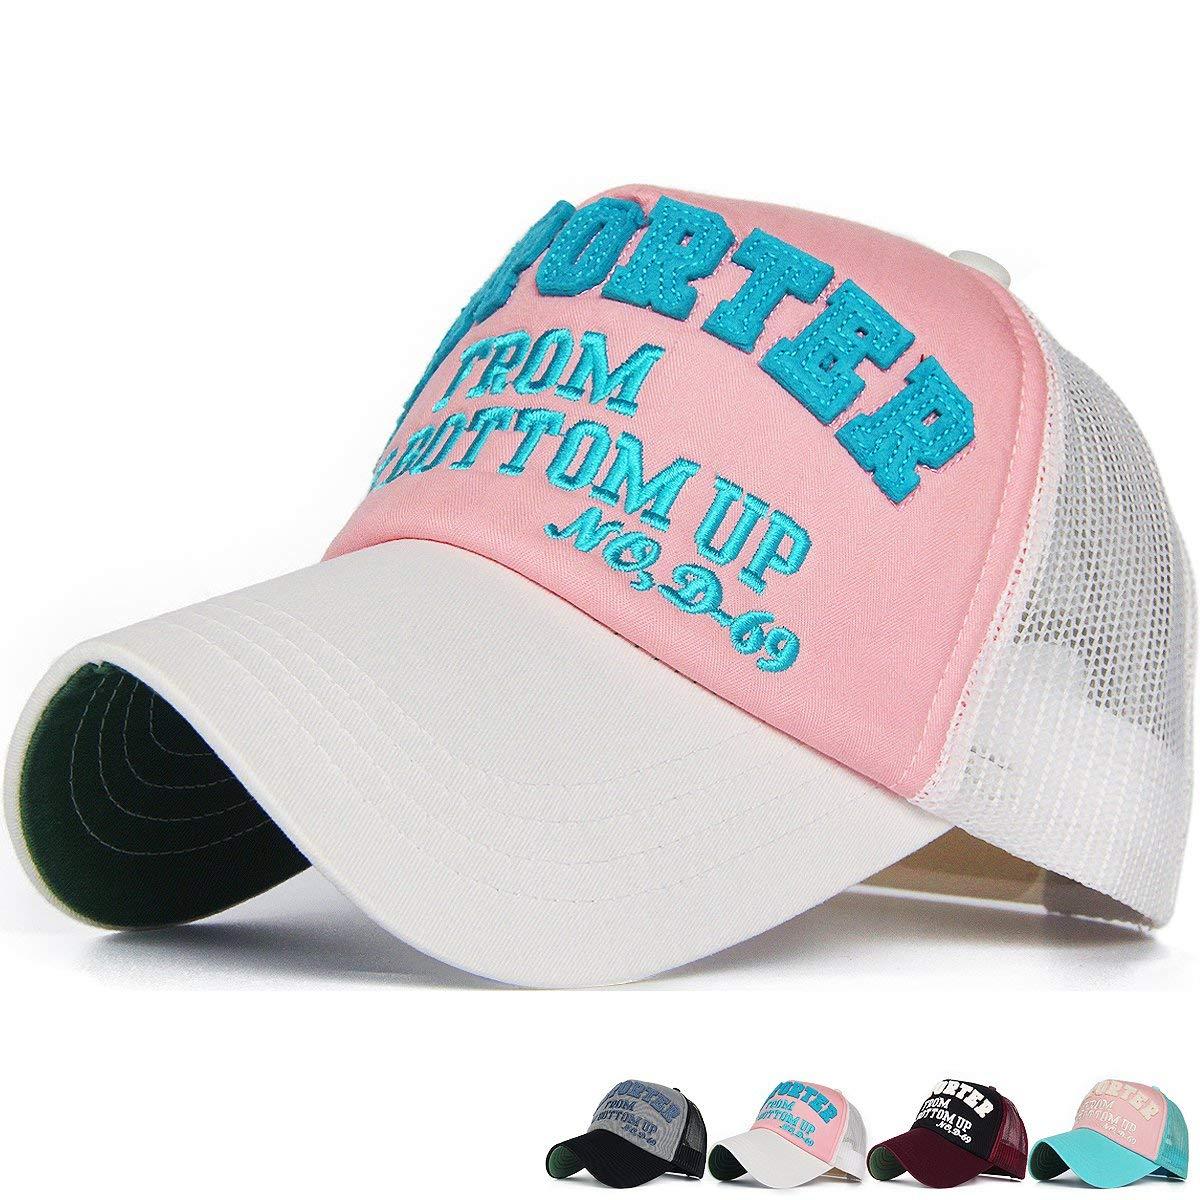 0754f05b5be Cheap Custom Curved Brim 5 Panel Trucker Hats, find Custom Curved ...